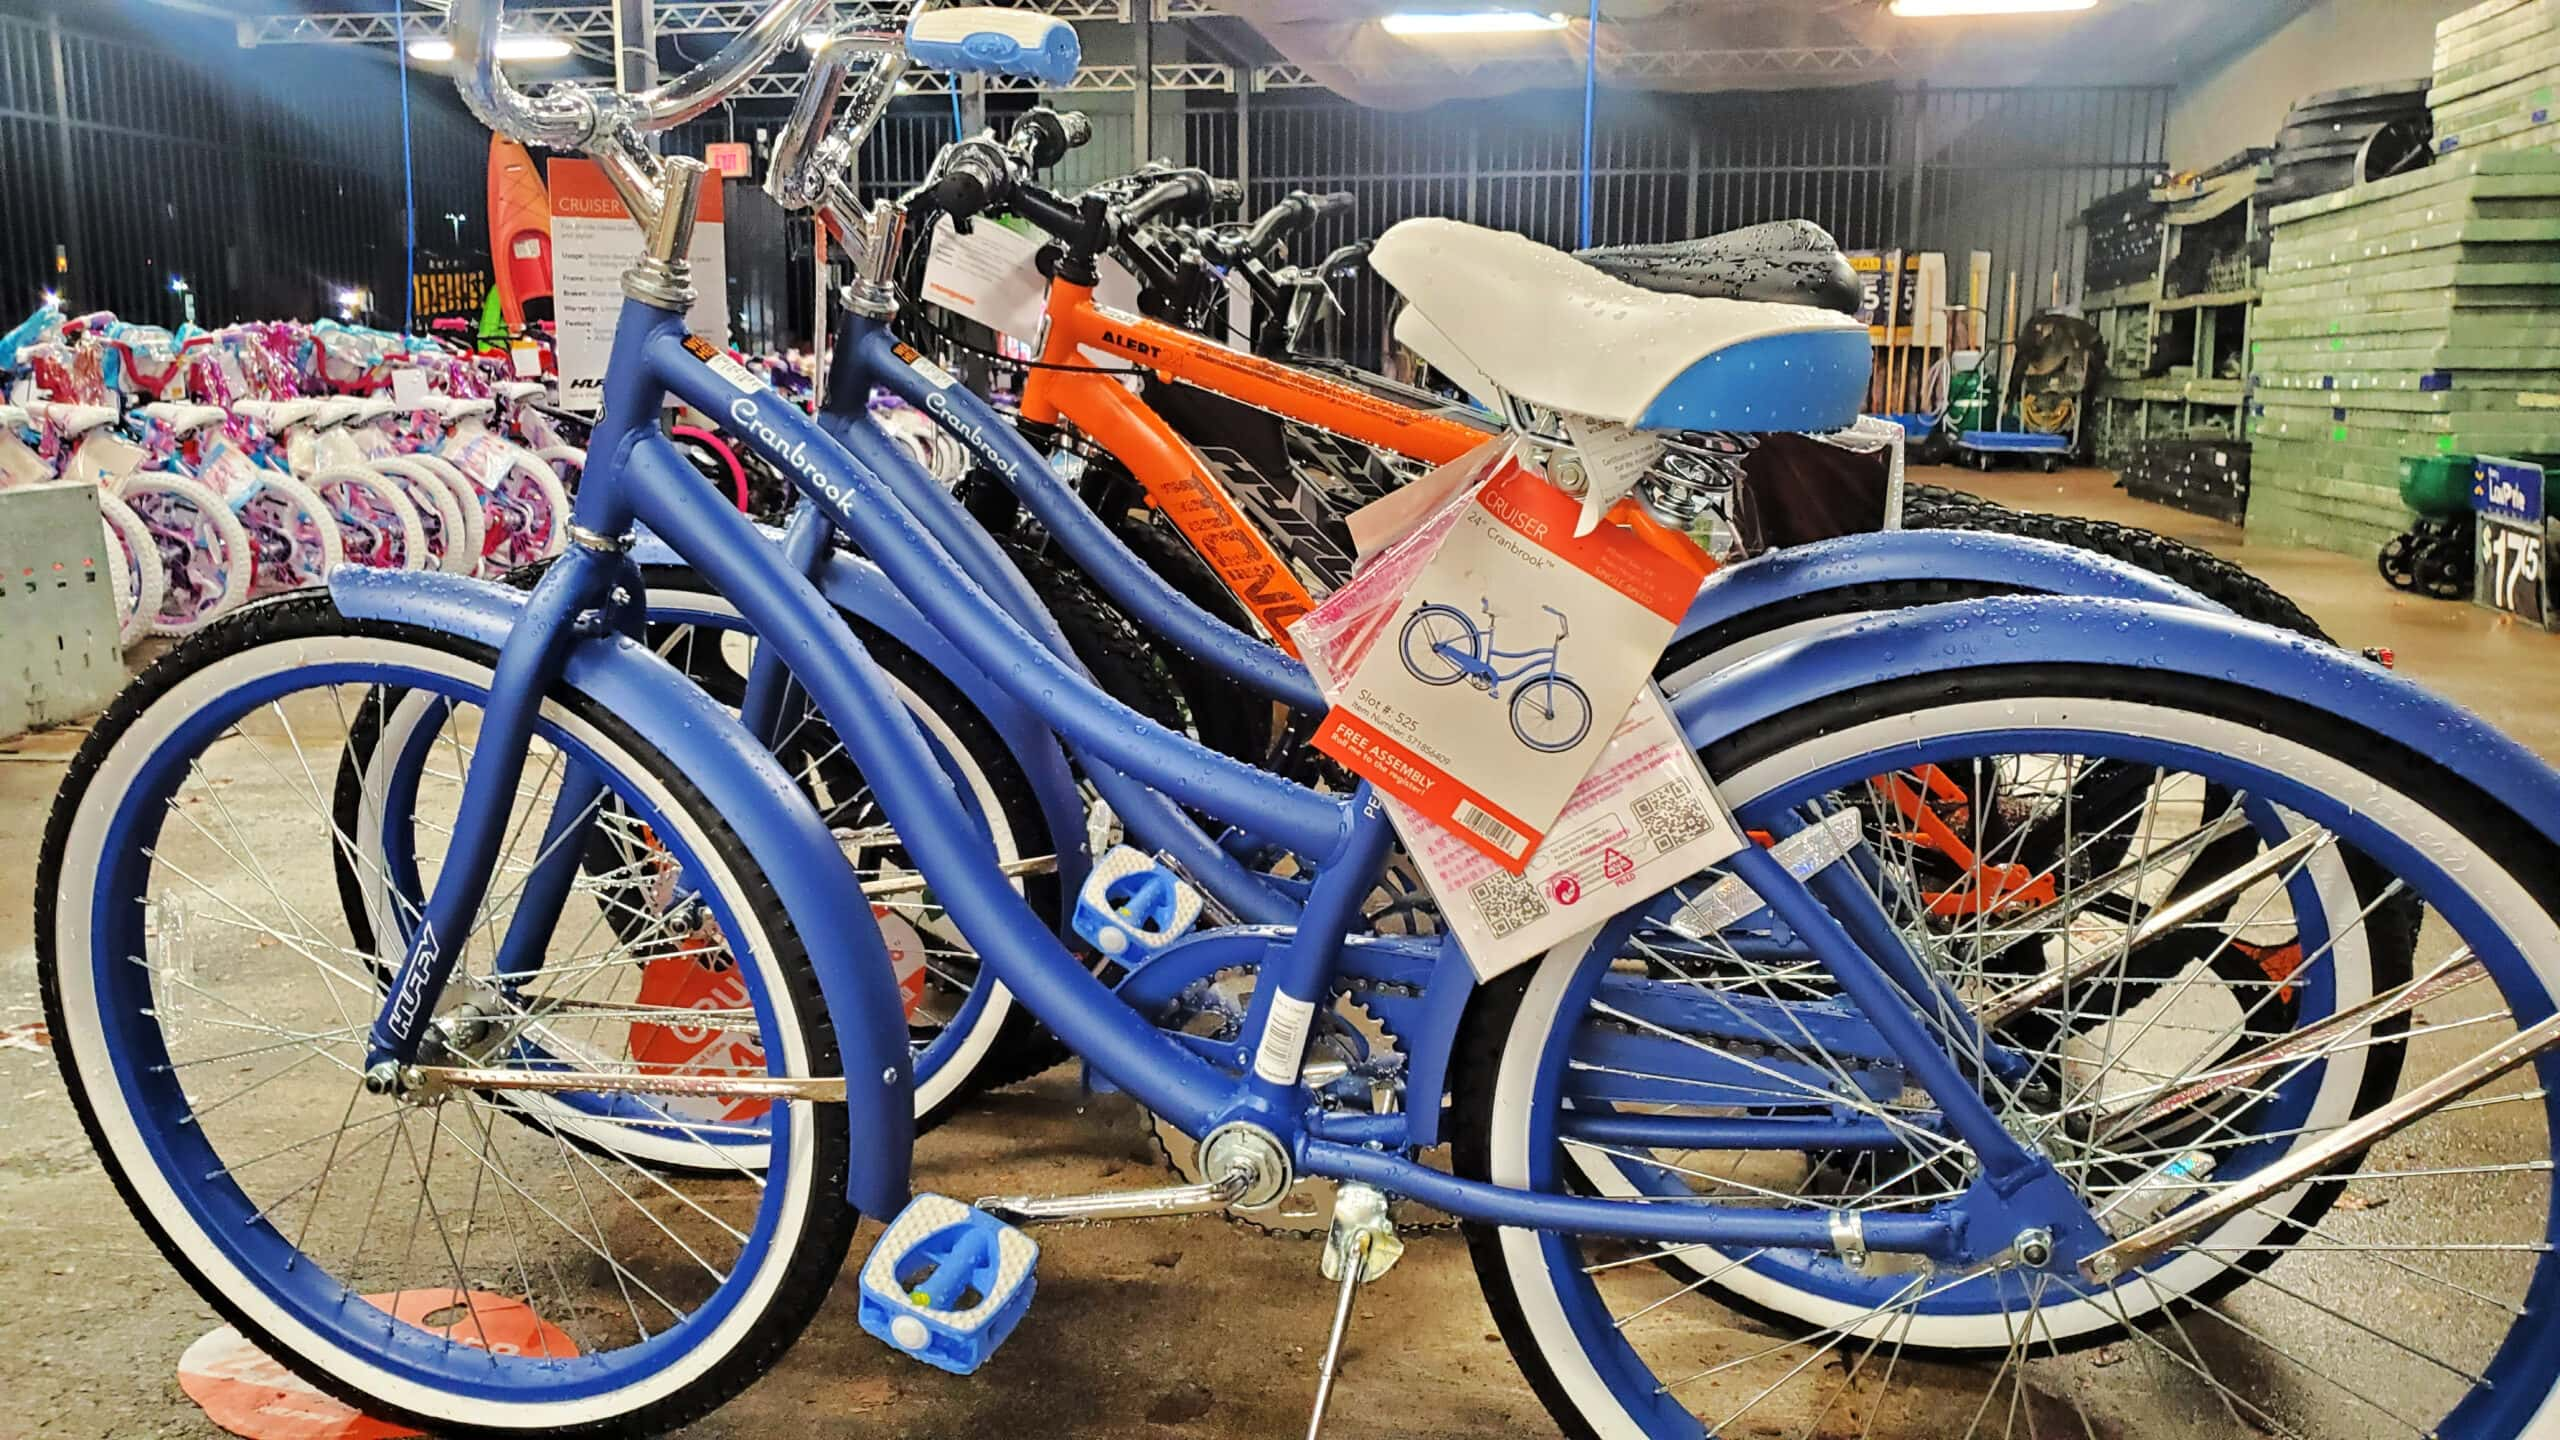 cruiser bikes at walmart